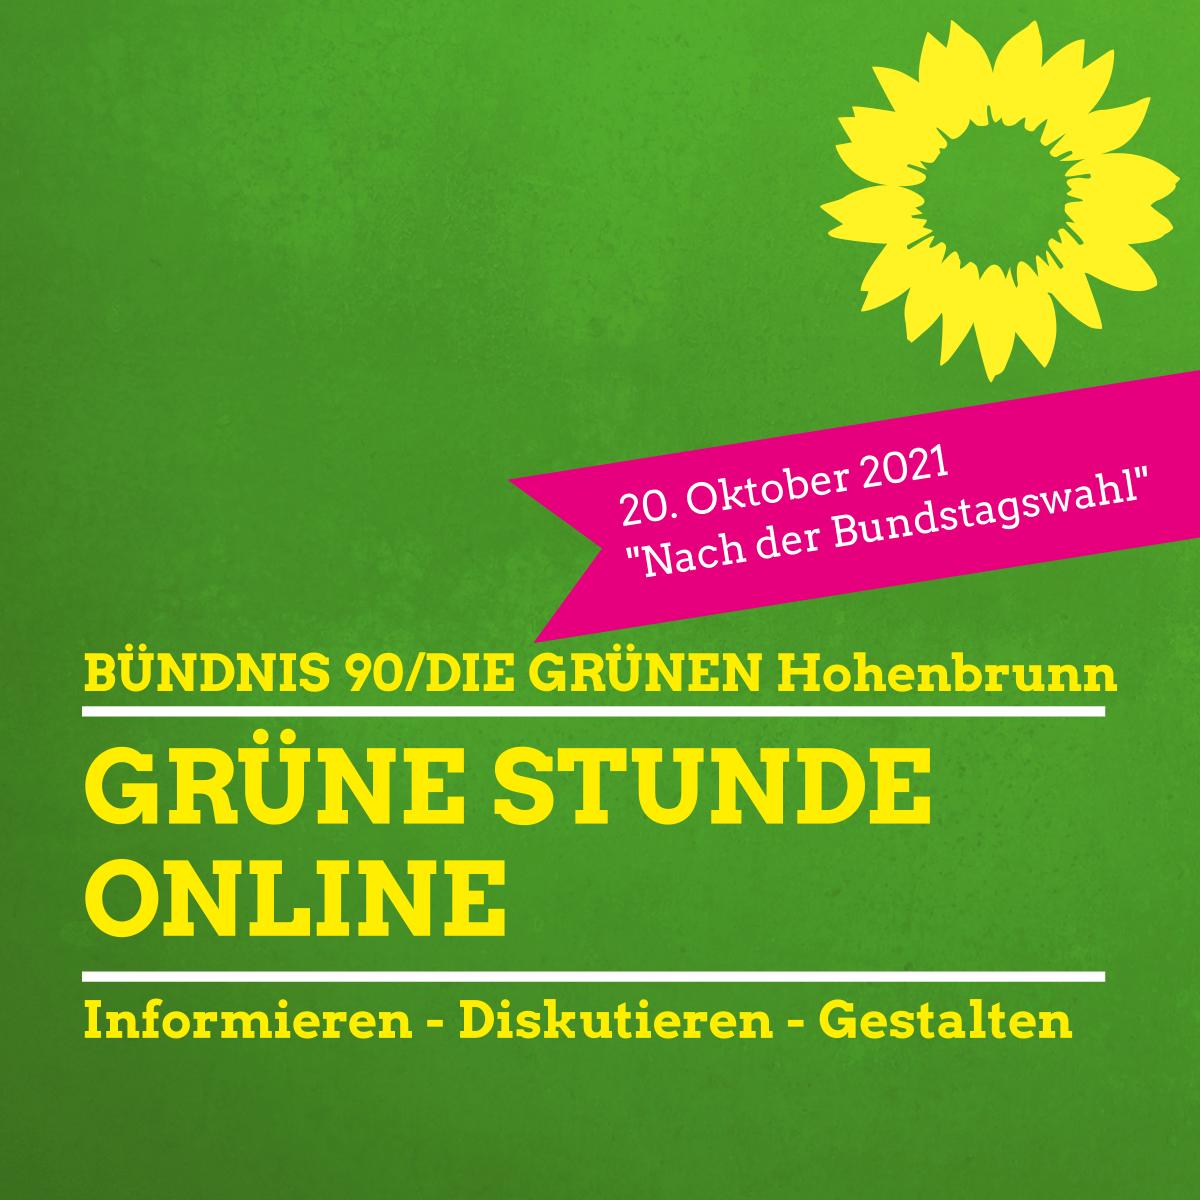 GRÜNE STUNDE online